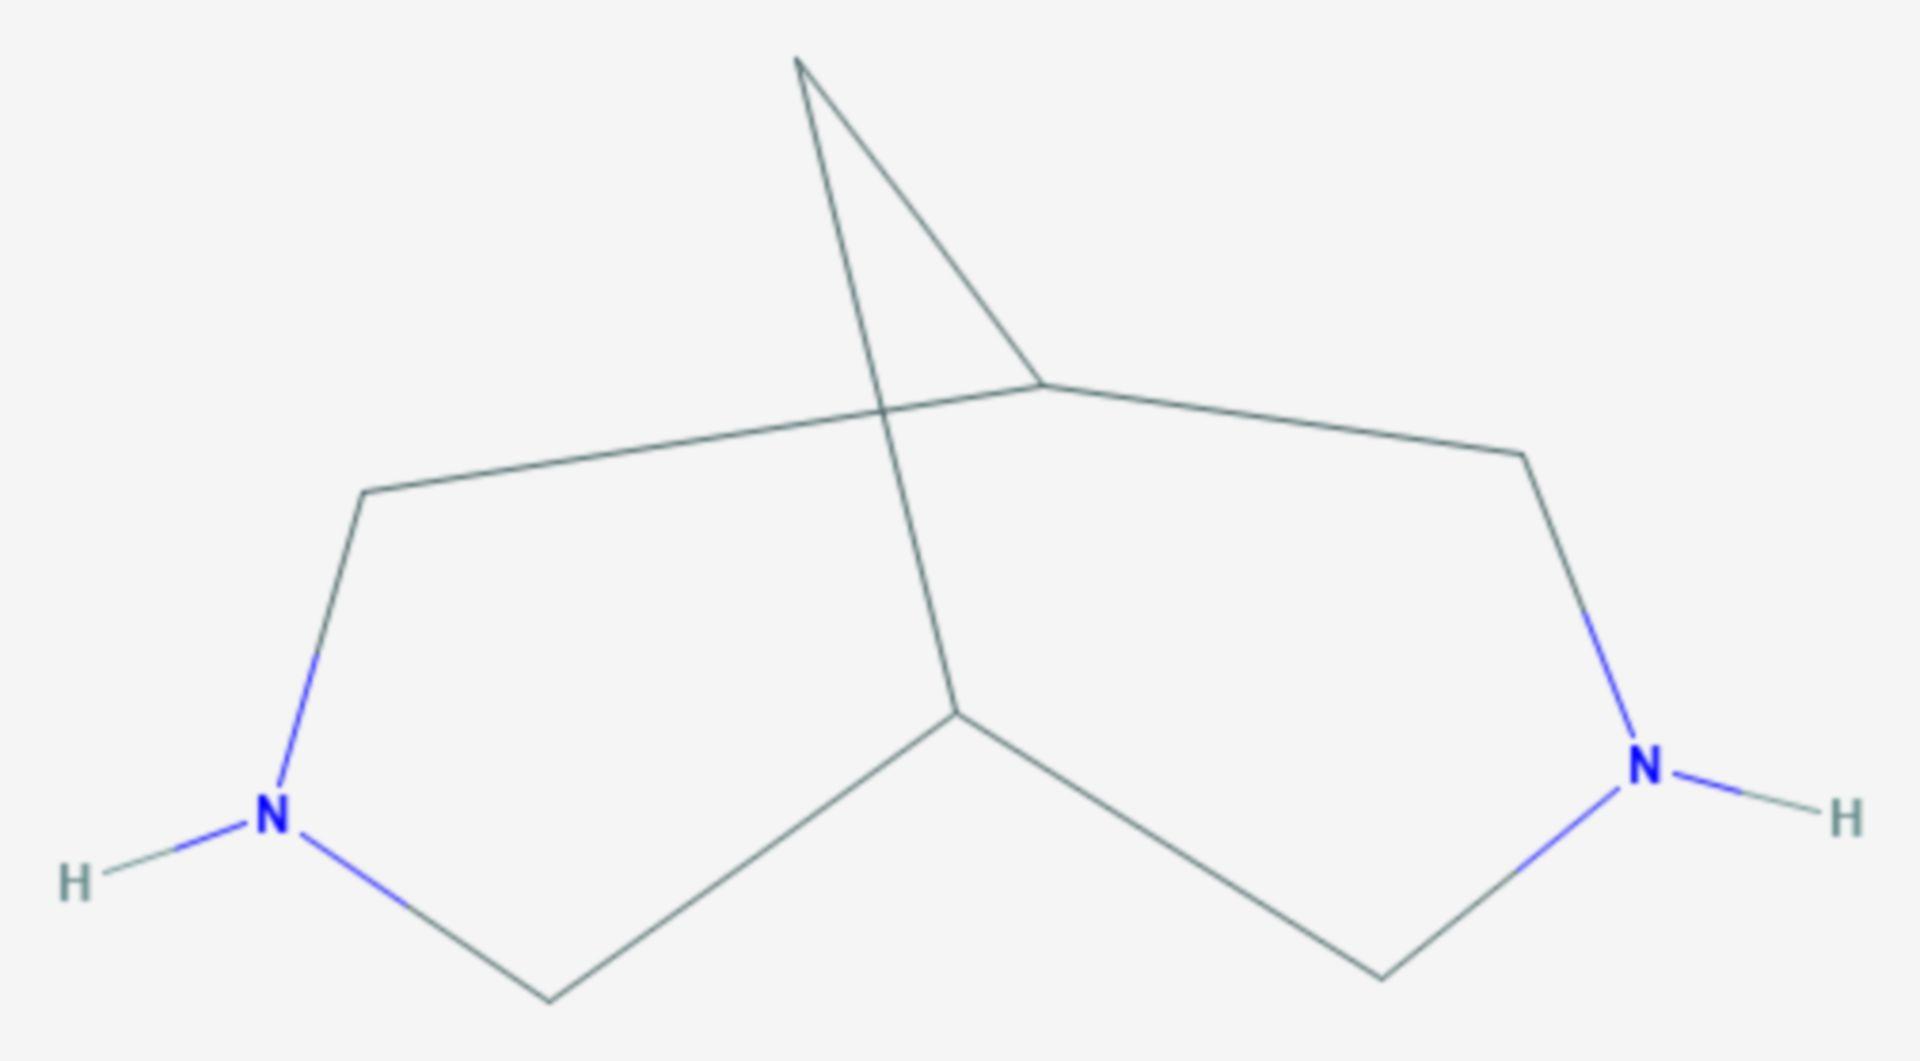 Bispidin (Strukturformel)